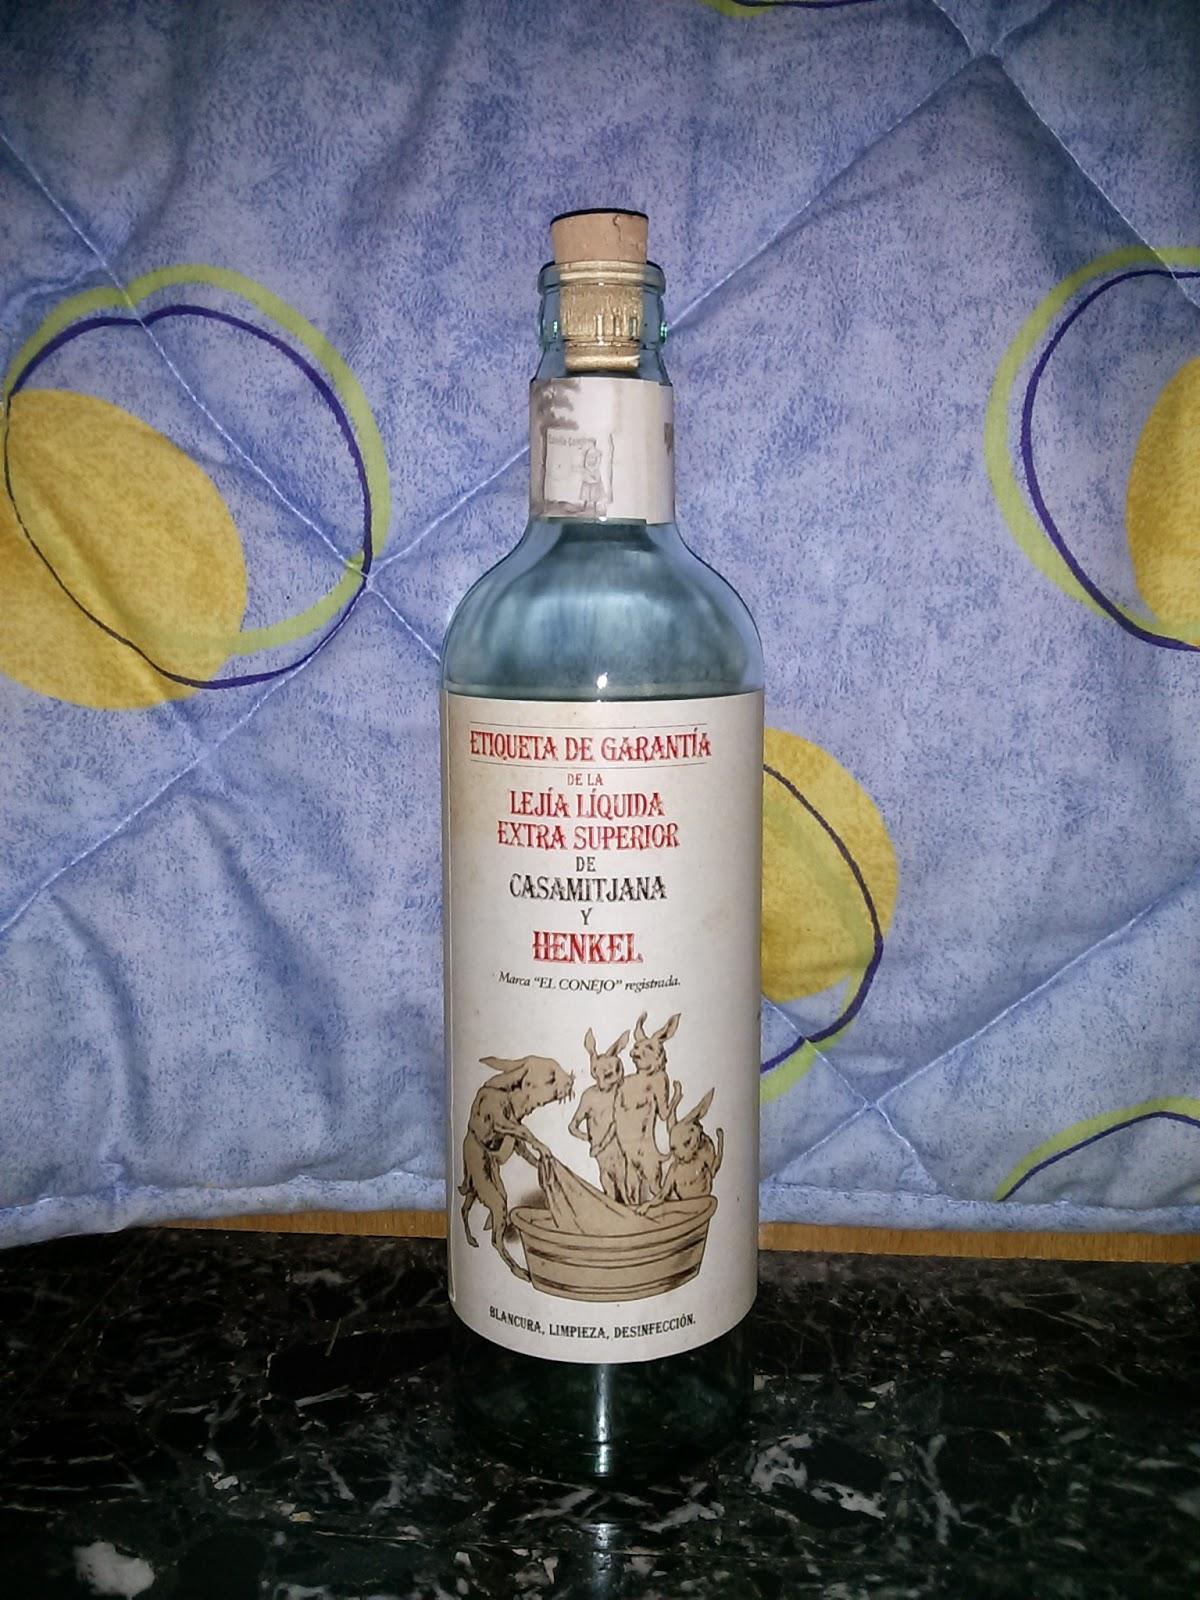 Conejo primera botella lejia